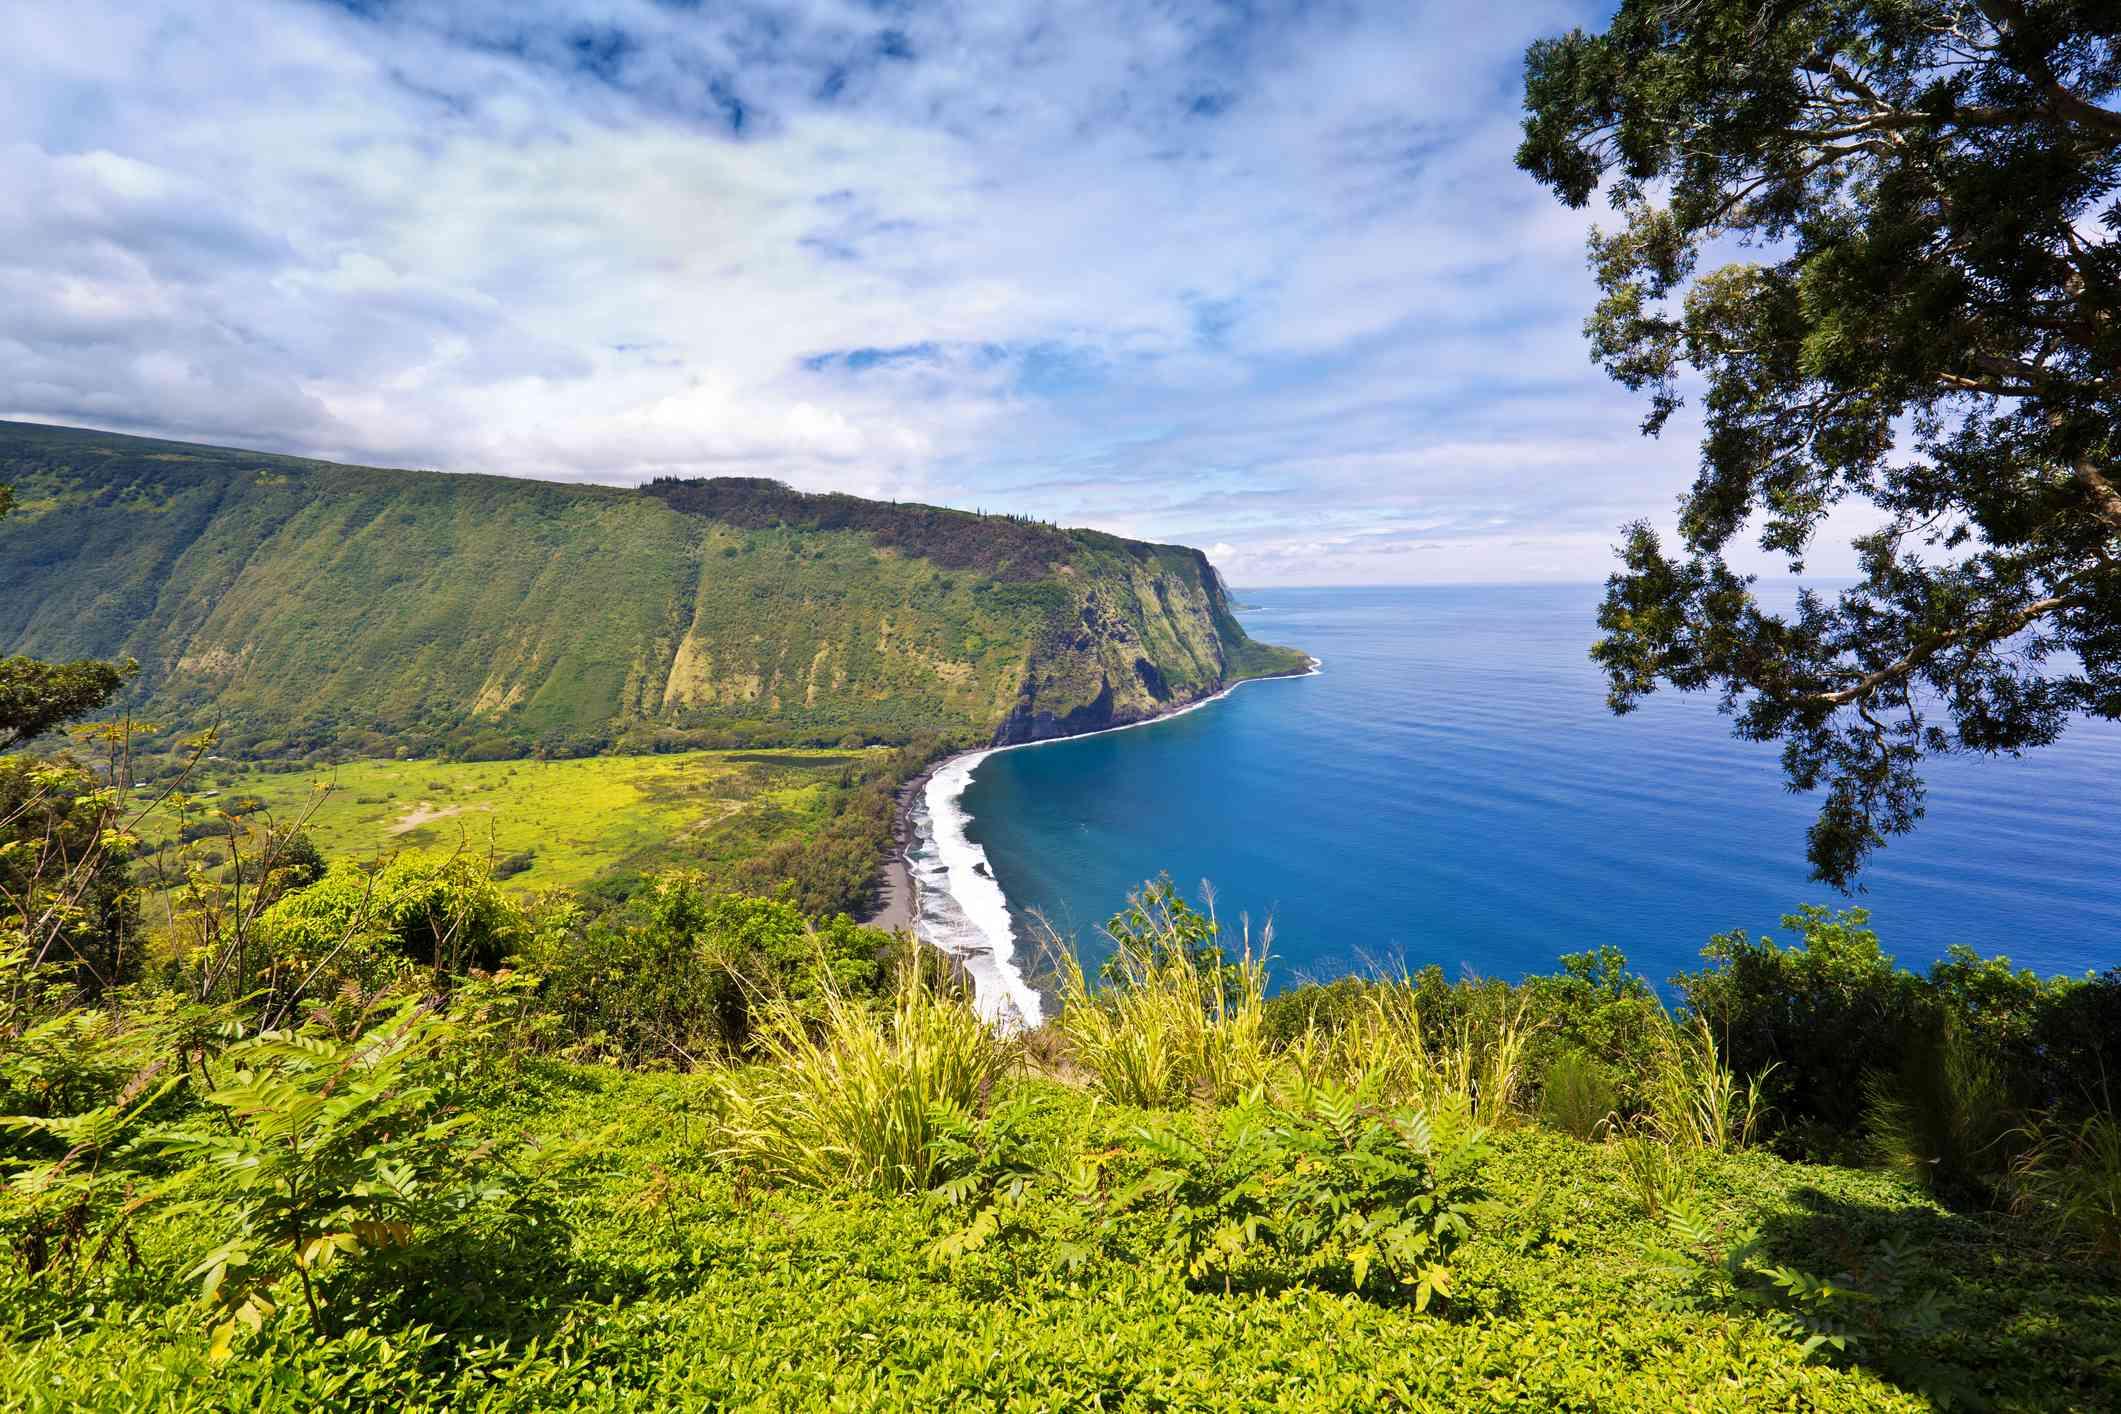 Waipio Valley along the Hamakua Coast, Hawaii